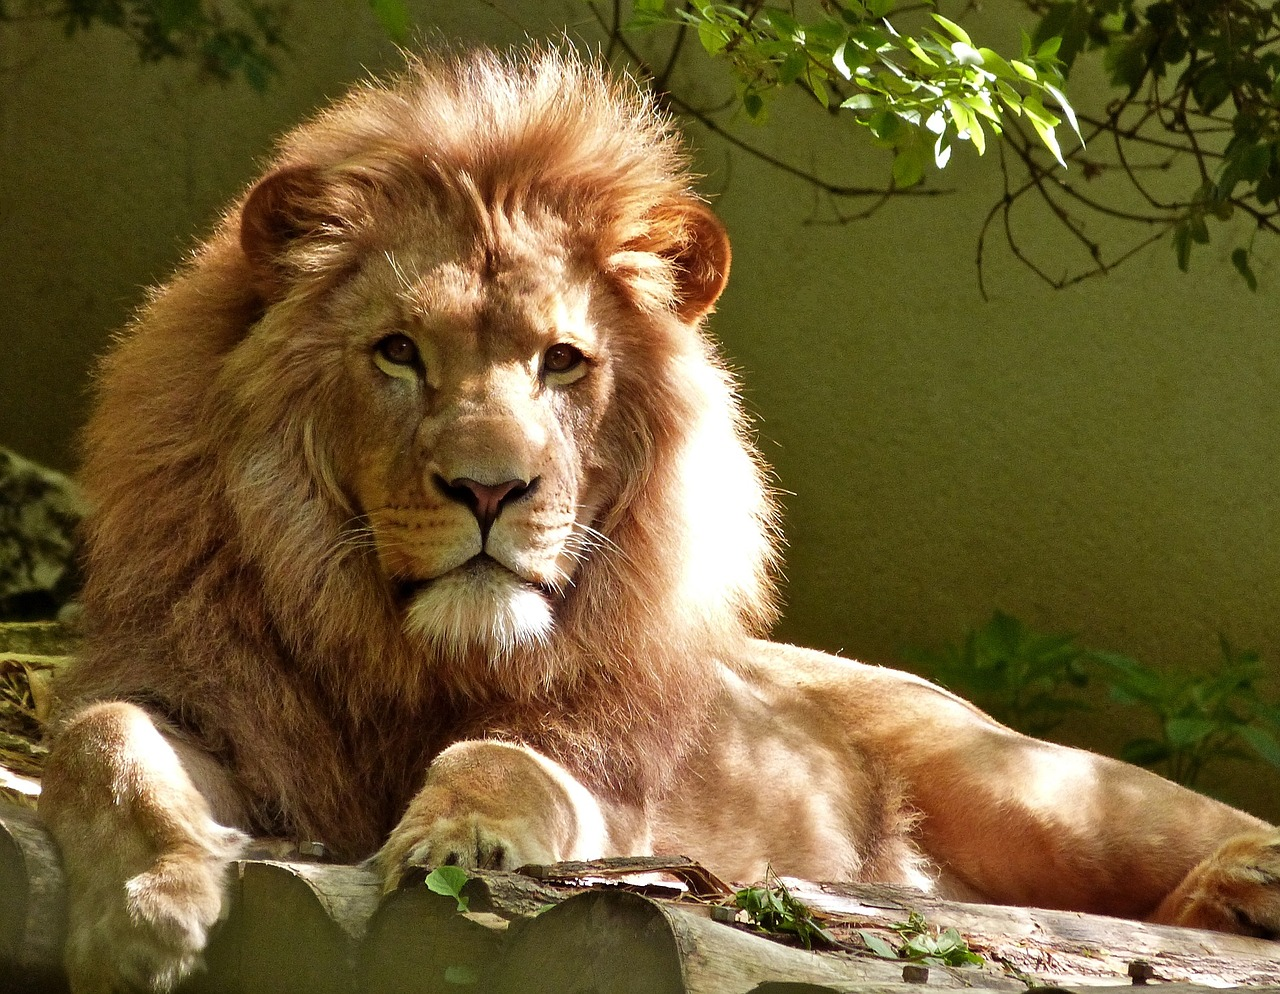 lion-1840092_1280.jpg